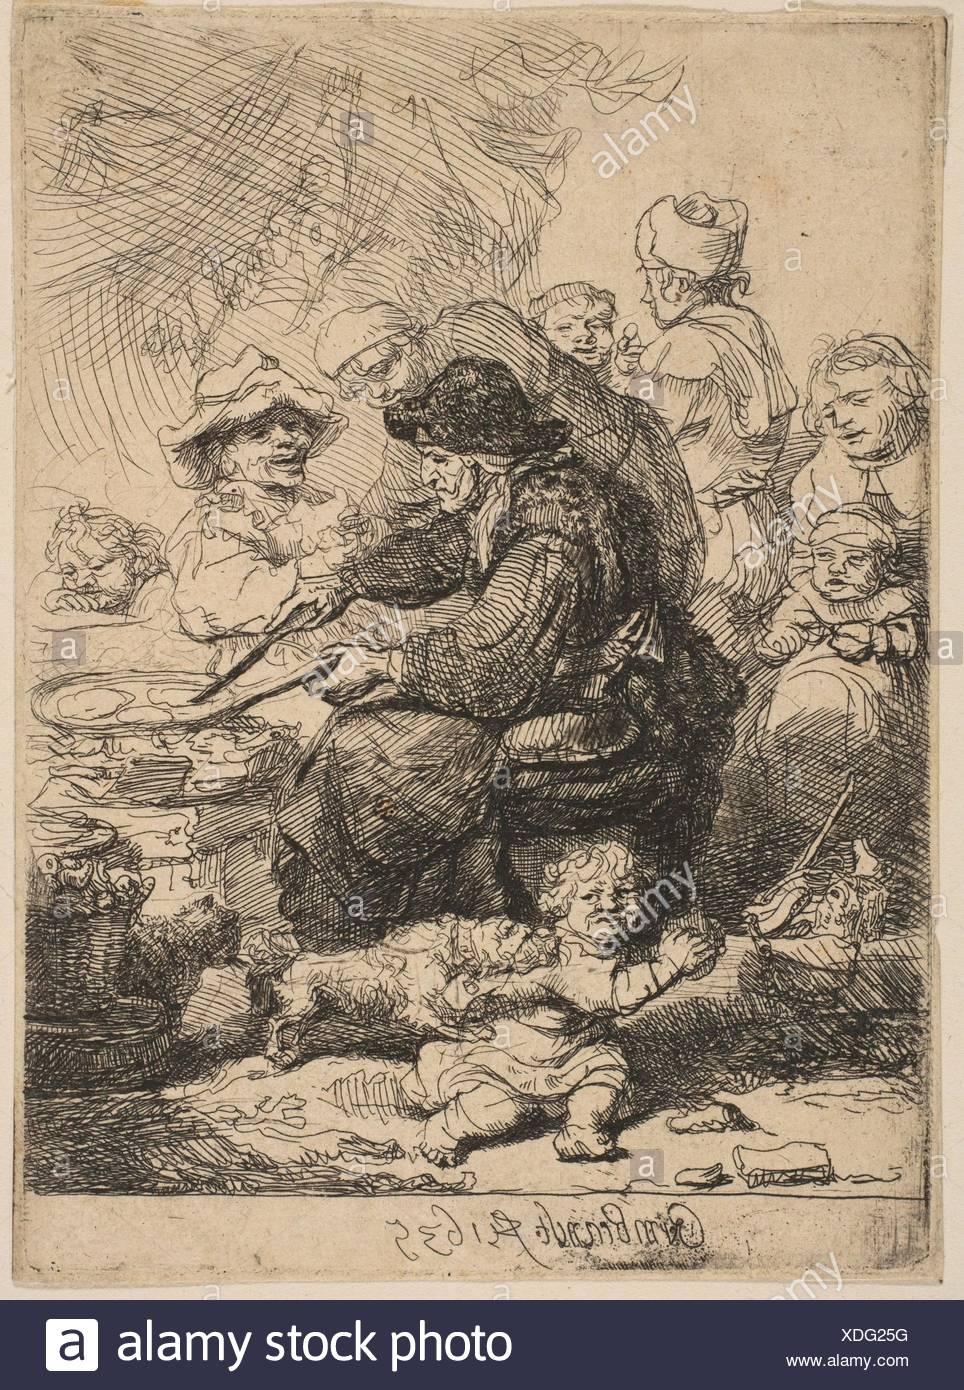 Artist: Rembrandt (Rembrandt van Rijn) (Dutch, Leiden 1606-1669 Amsterdam);  Date: 1635; Medium: Etching; Dimensions: Sheet: 4 3/8